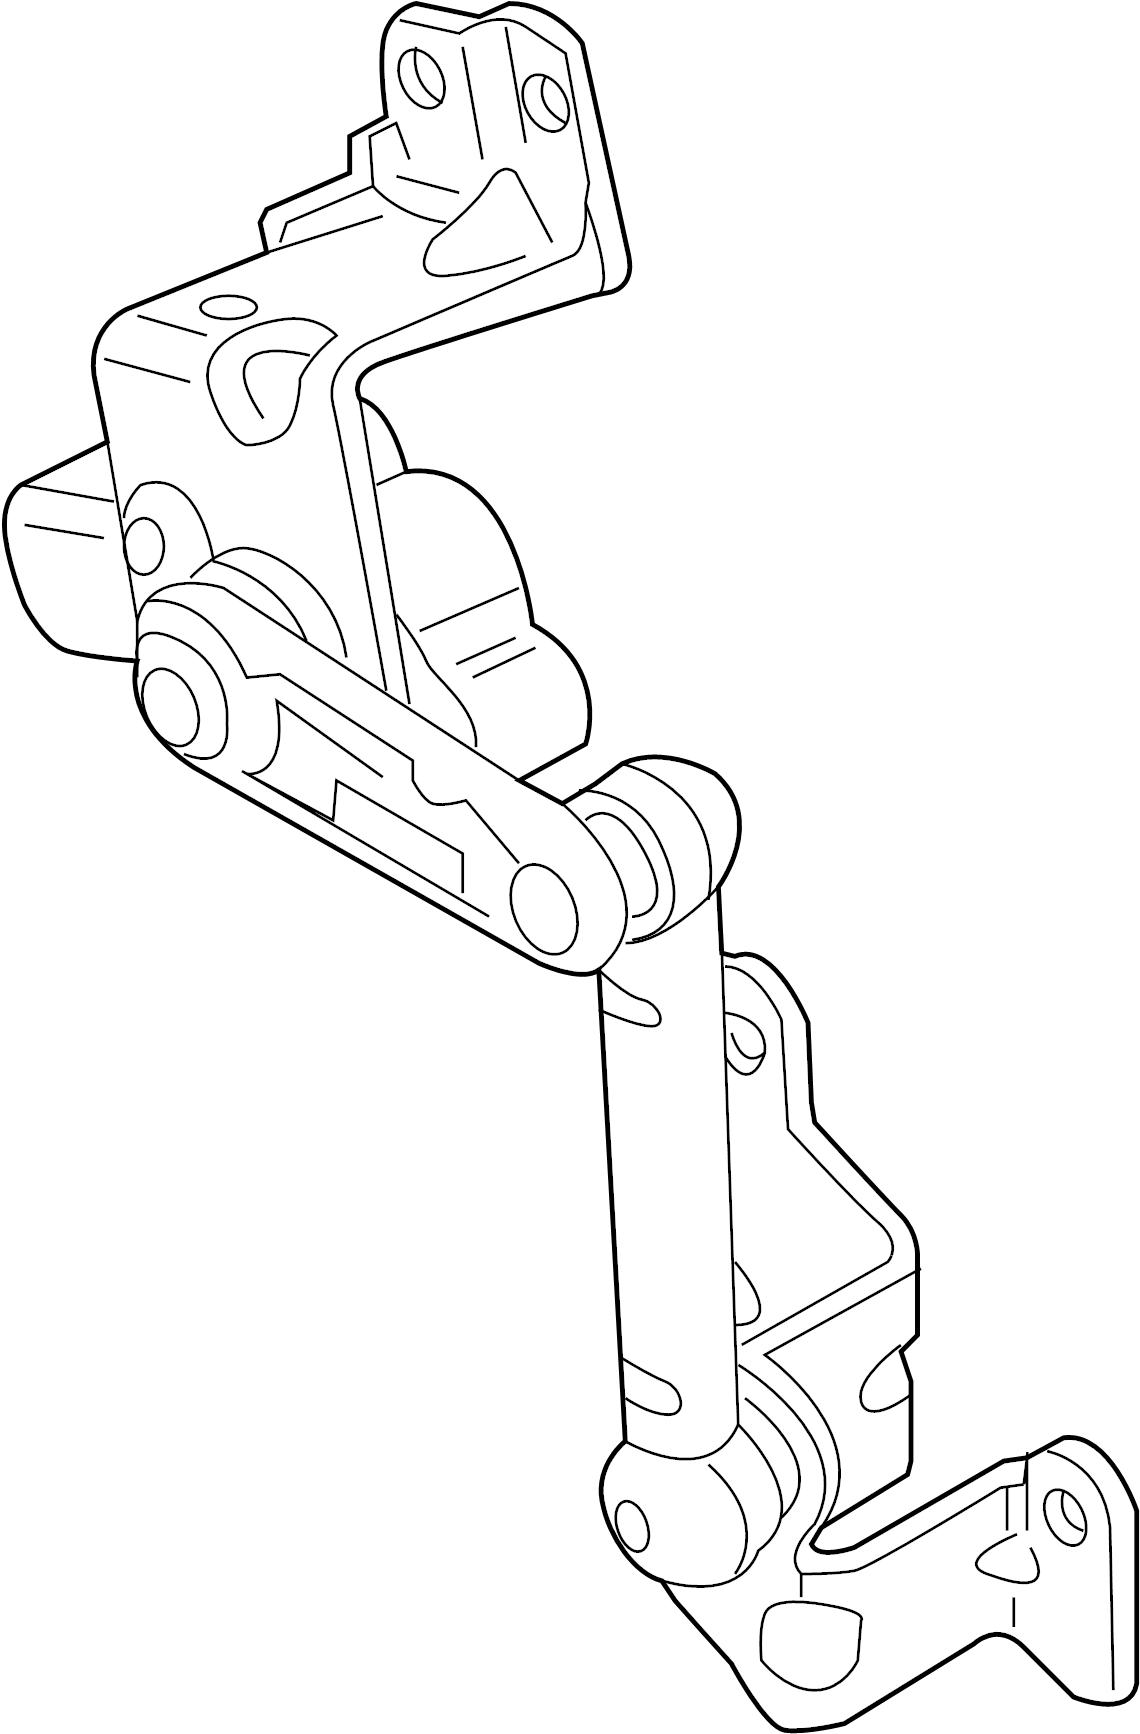 2006 Audi A3 Self-lev. Sensor with linkage. SELFLEVELLING